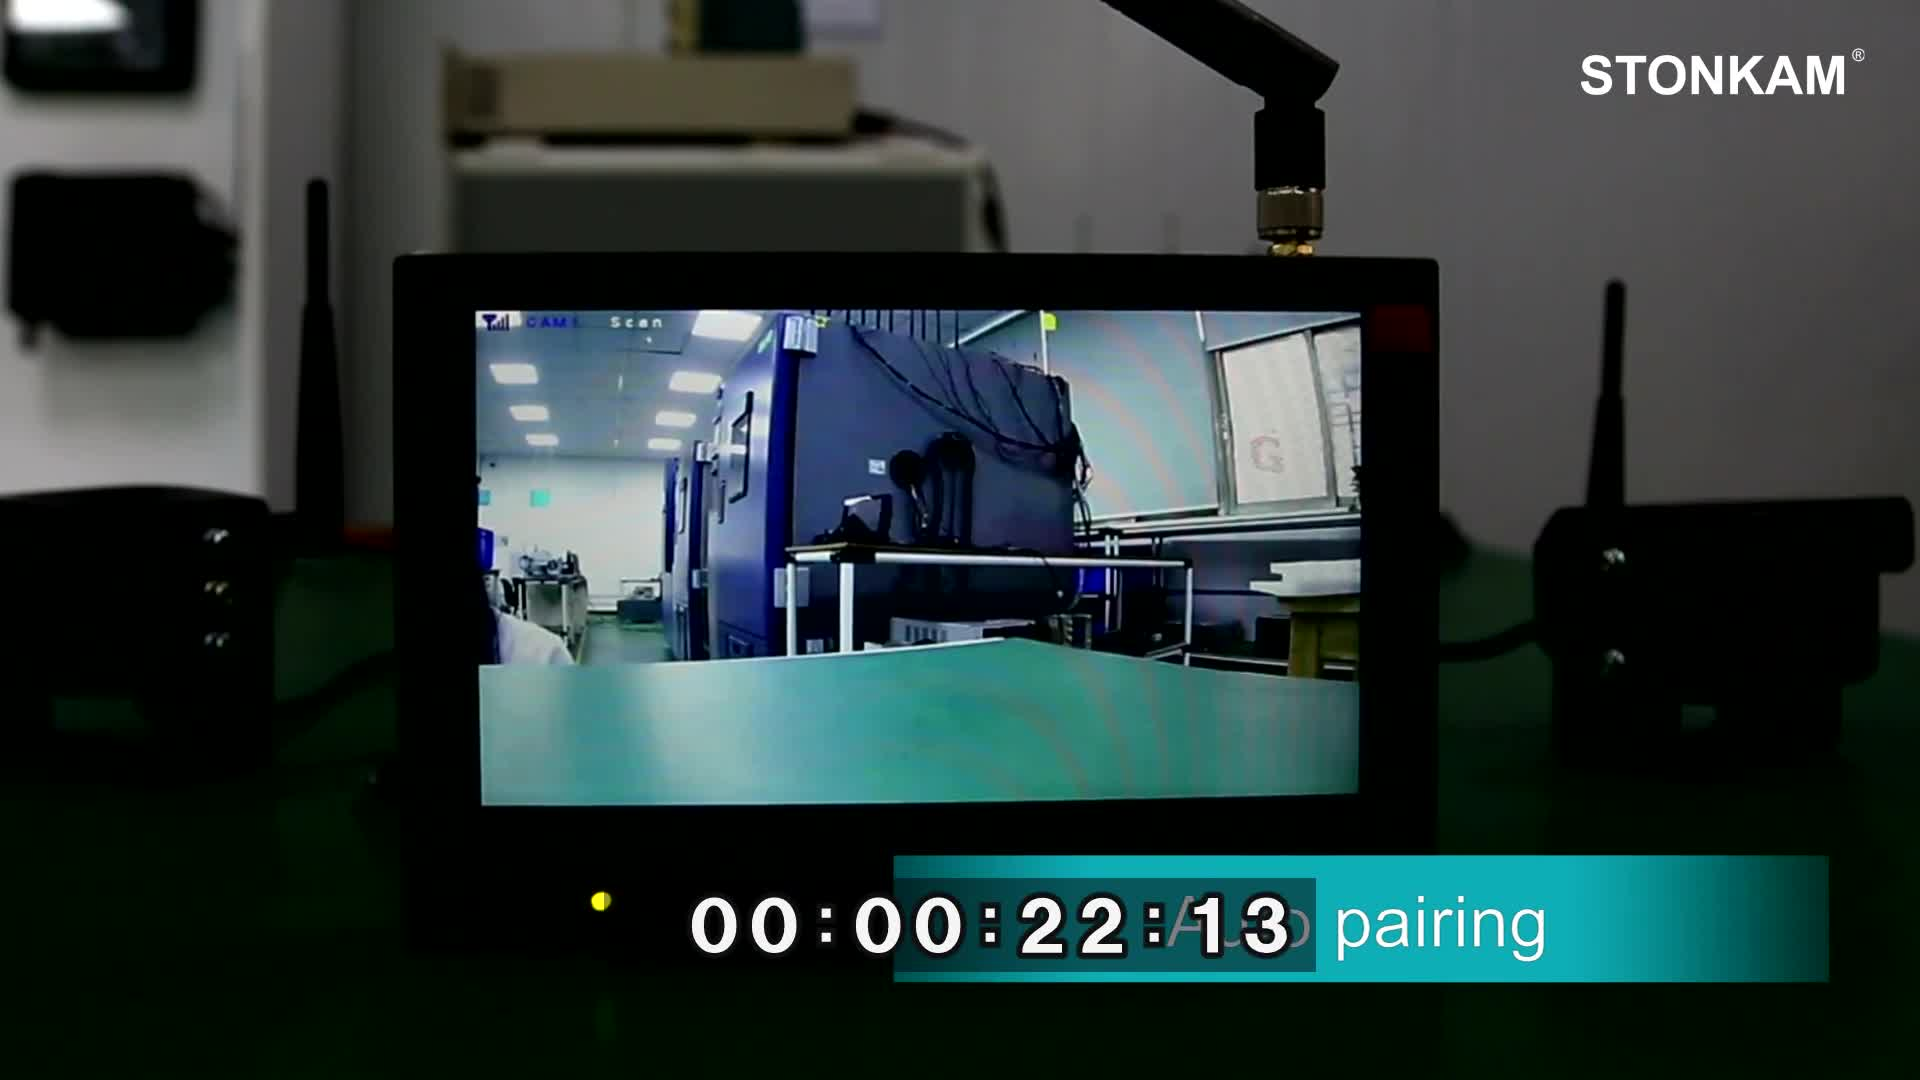 720 1080p 7 インチデジタルワイヤレス逆カメラトラック